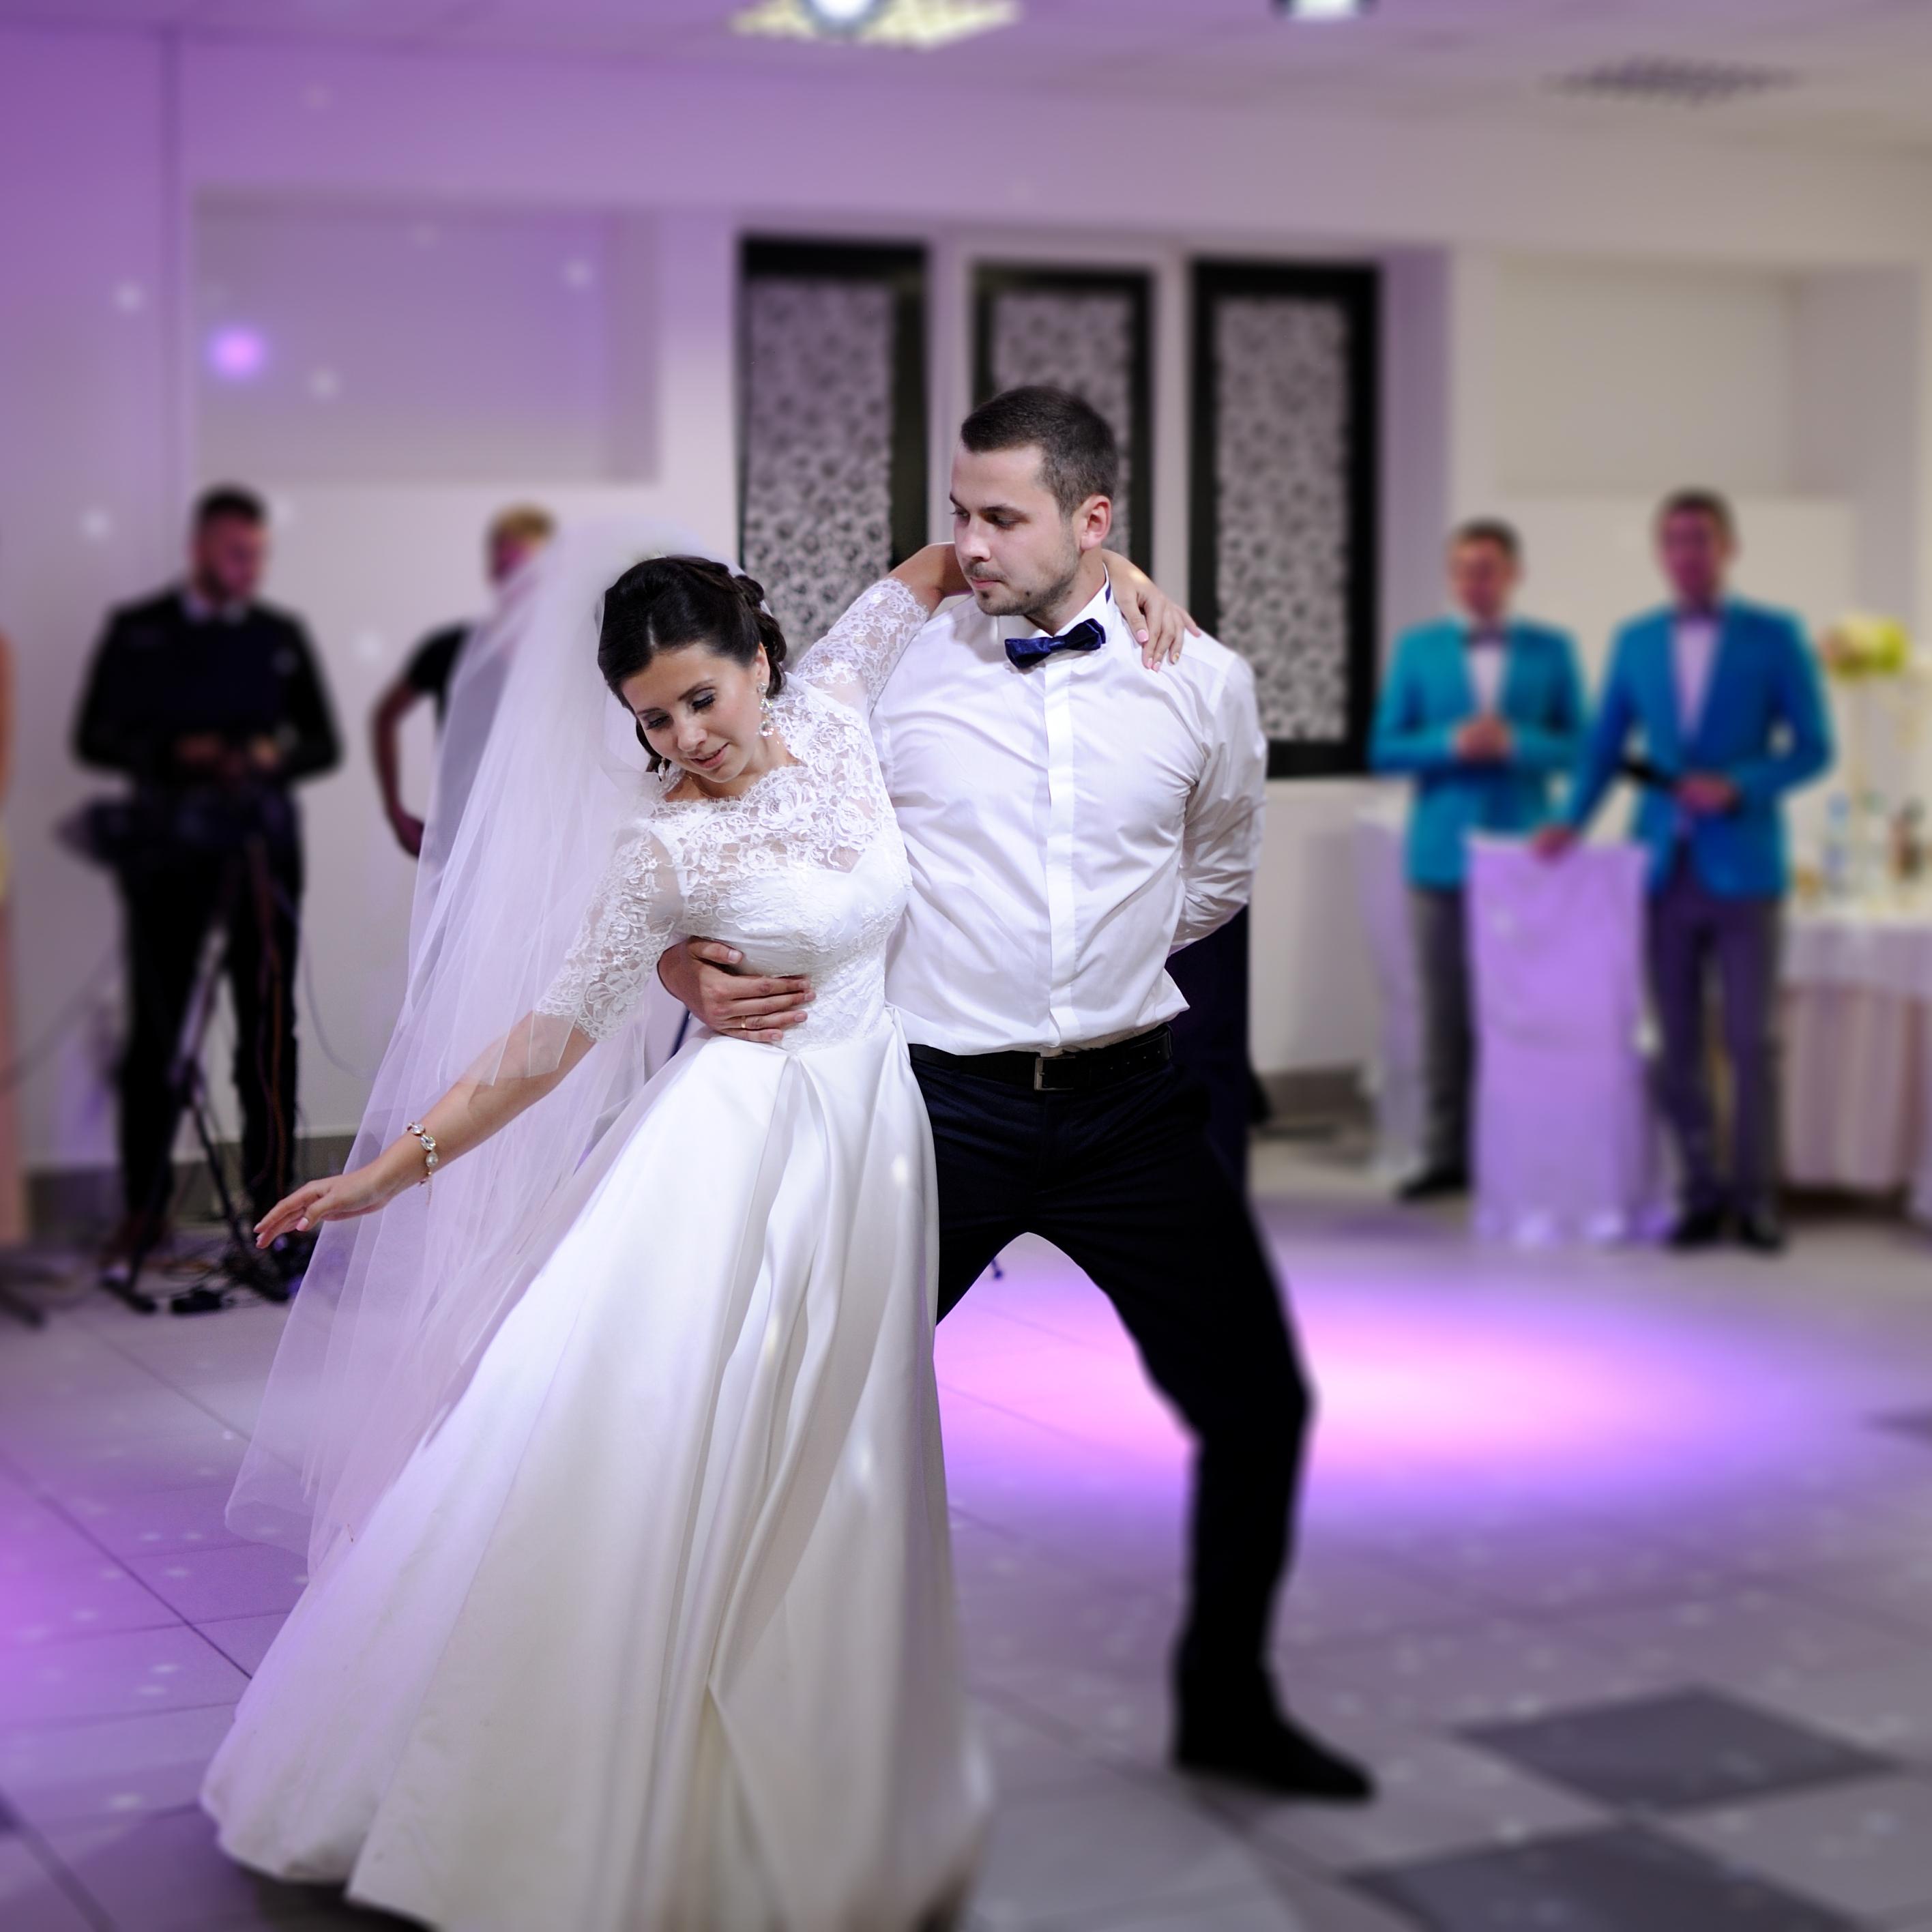 bride and groom dancing on the own weddi